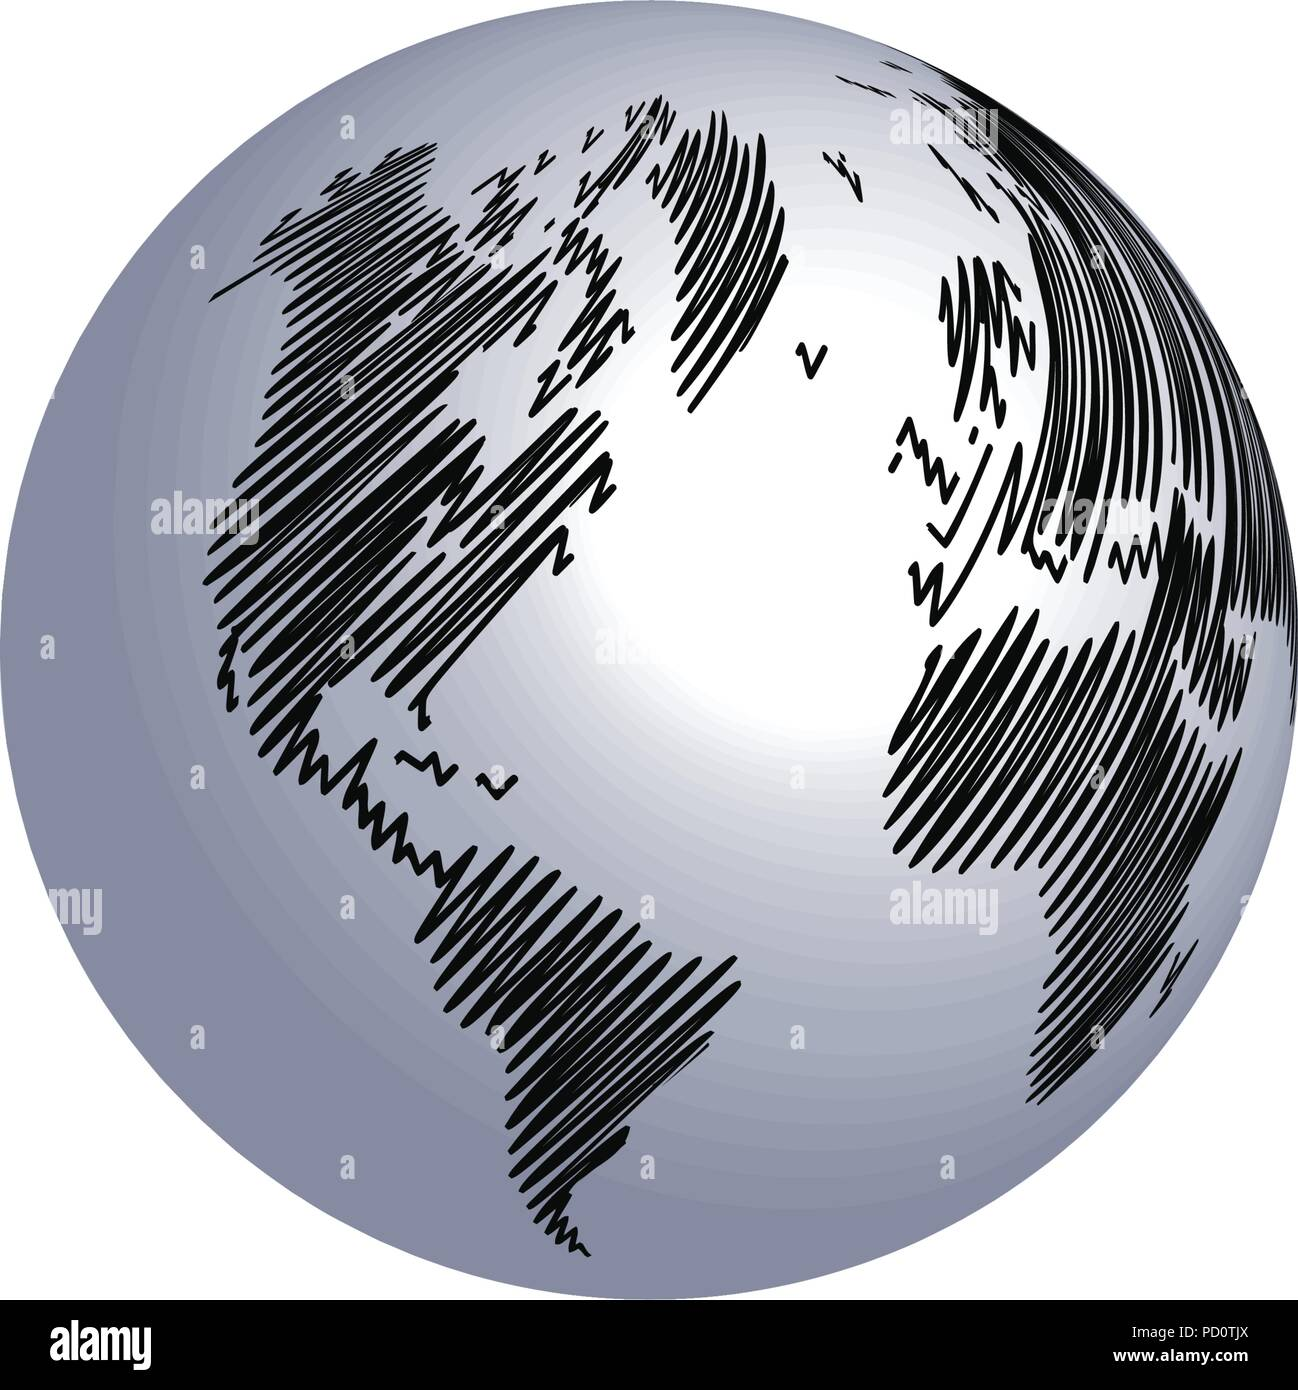 World map globe scribble template design element stock vector art world map globe scribble template design element gumiabroncs Choice Image